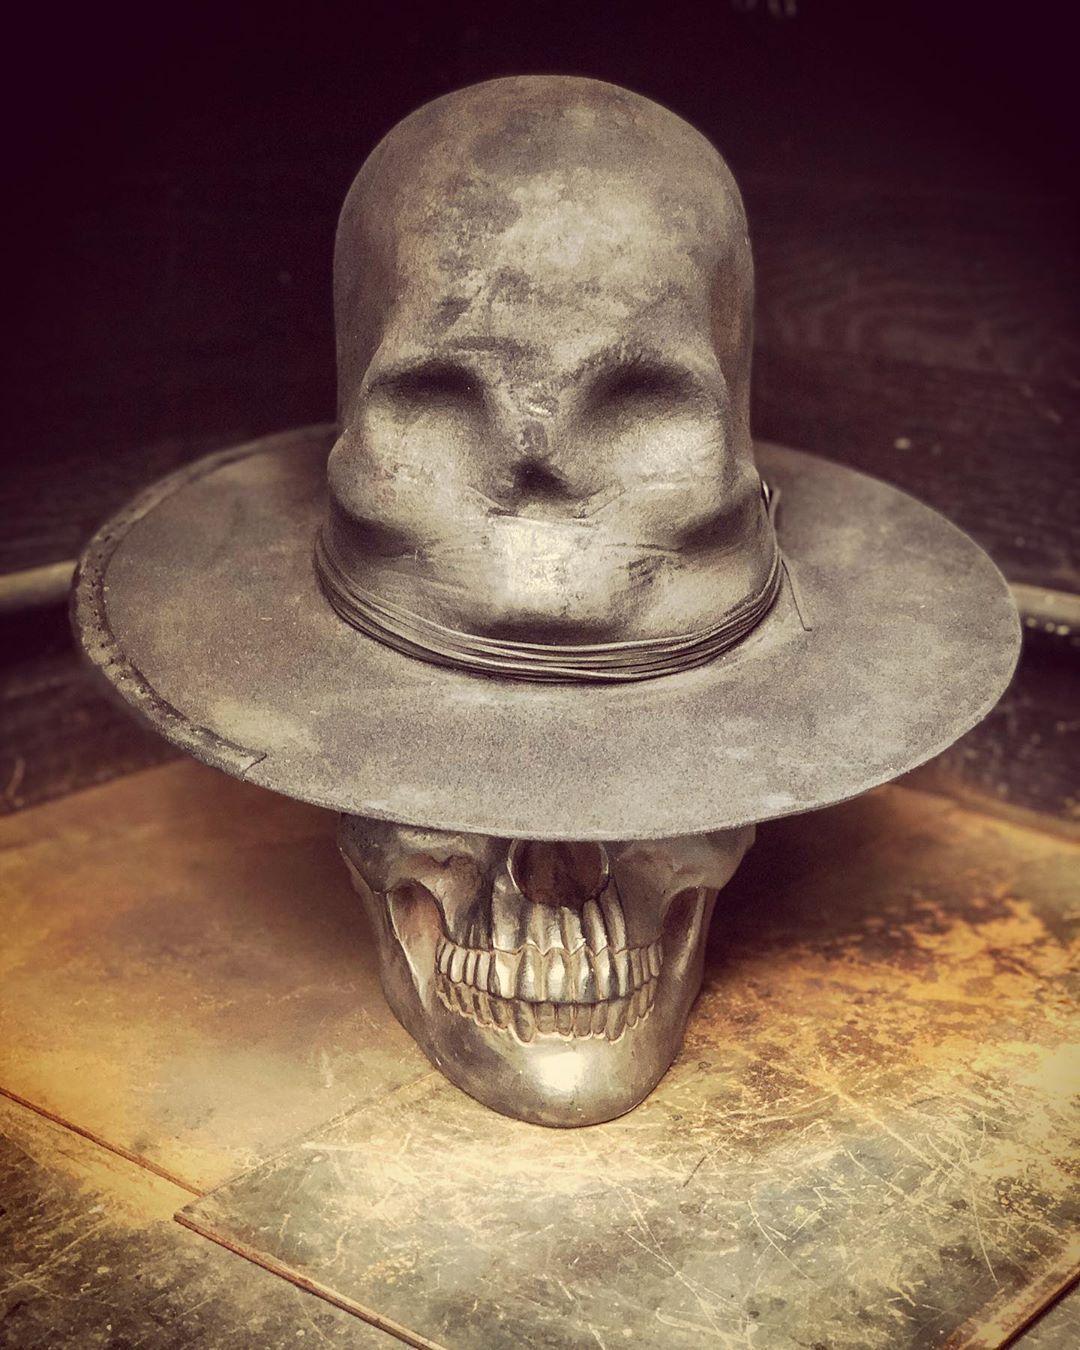 N T T E On Instagram ᑕᖇeᗩtiᐯity Iᔕ ᒪiᗰitᒪeᔕᔕ ᑌᑎᒪeᔕᔕ Yoᑌ ᔕet Yoᑌᖇ ᗯᗩᒪᒪᔕ Eᐯeᑎ Tᕼeᑎ ᑕᕼooᔕe Tᕼe ᔕky Goodmonday In 2020 Hats For Men Rock N Roll Hats